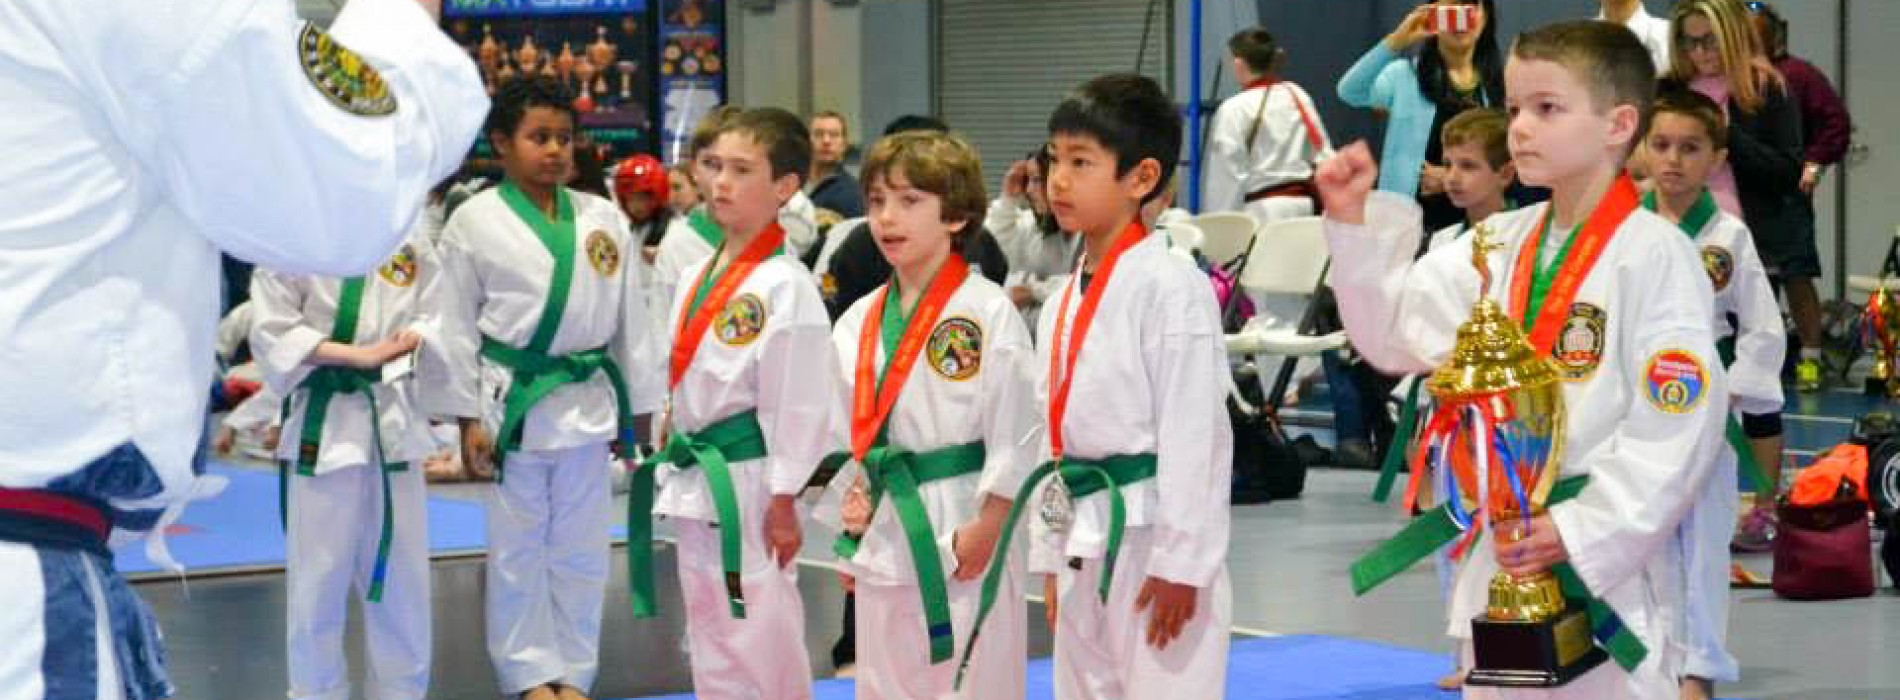 2017 Delaware County Karate Championships